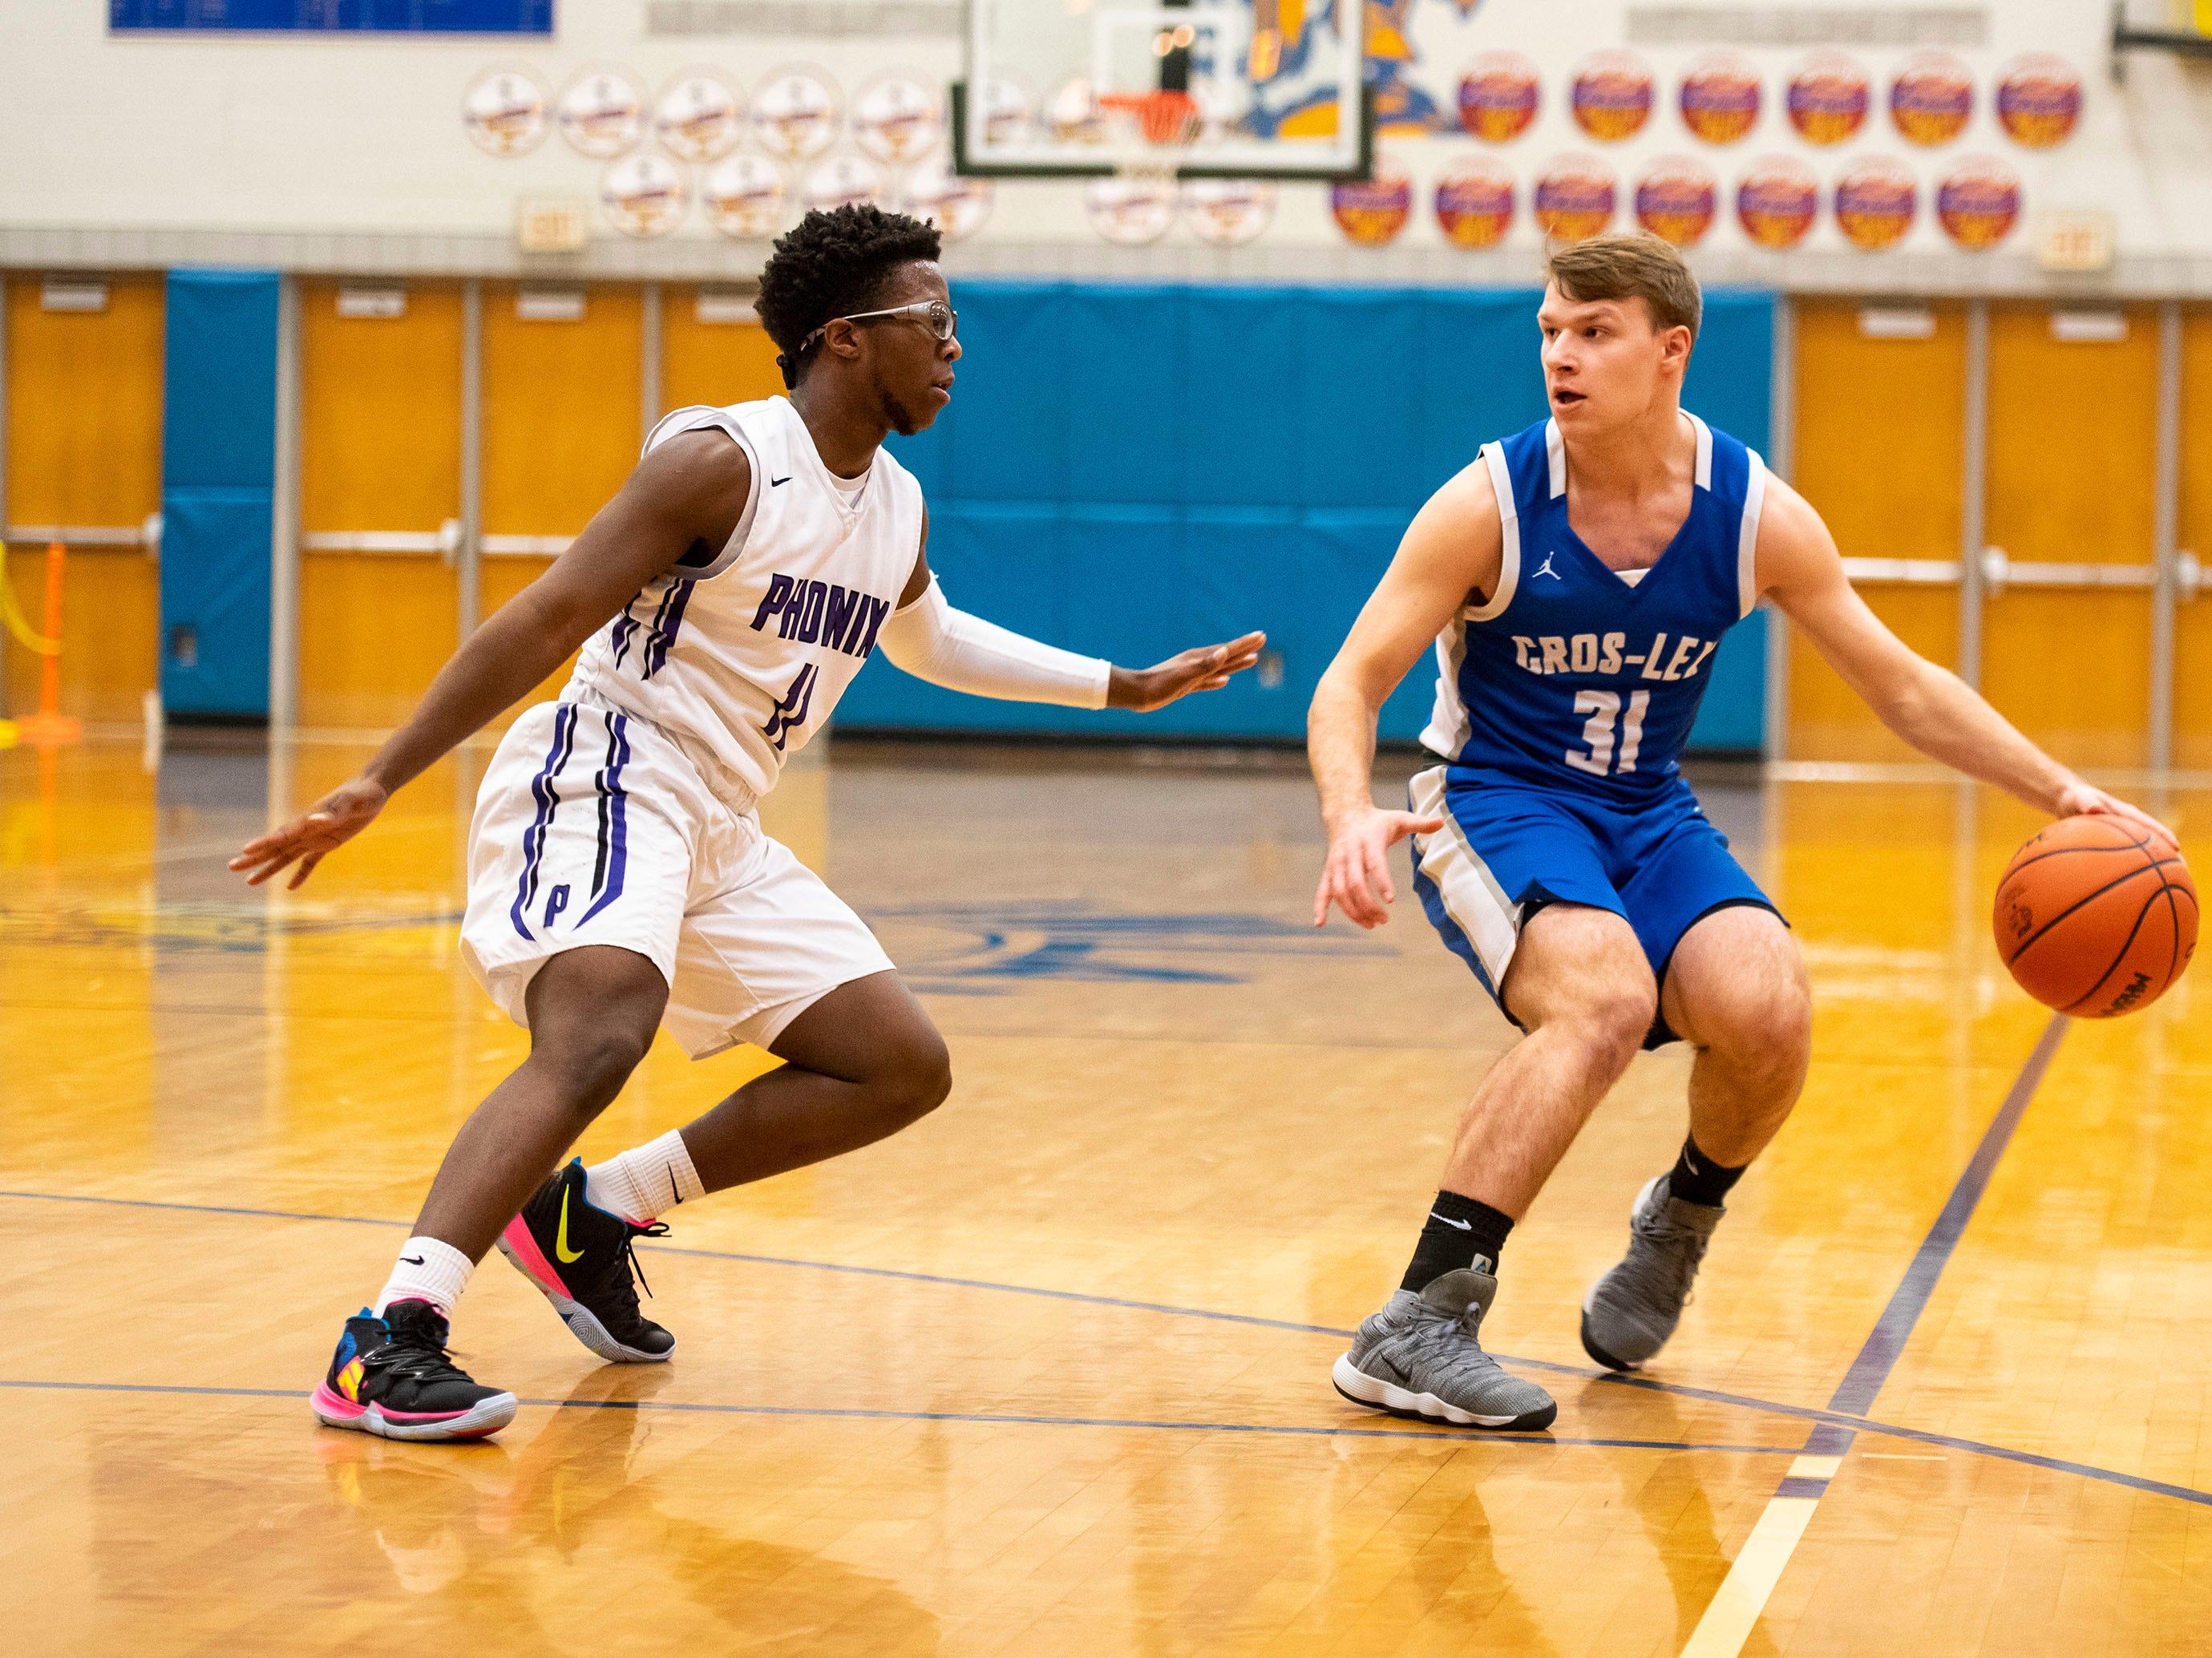 Pontiac's Keyshaun Shelmonson-Bey (11) defends against Cros-Lex High School's Matthew Kerrigan in the MHSAA Division 2 regional basketball game Tuesday, March 5, 2019 at Imlay City High School.